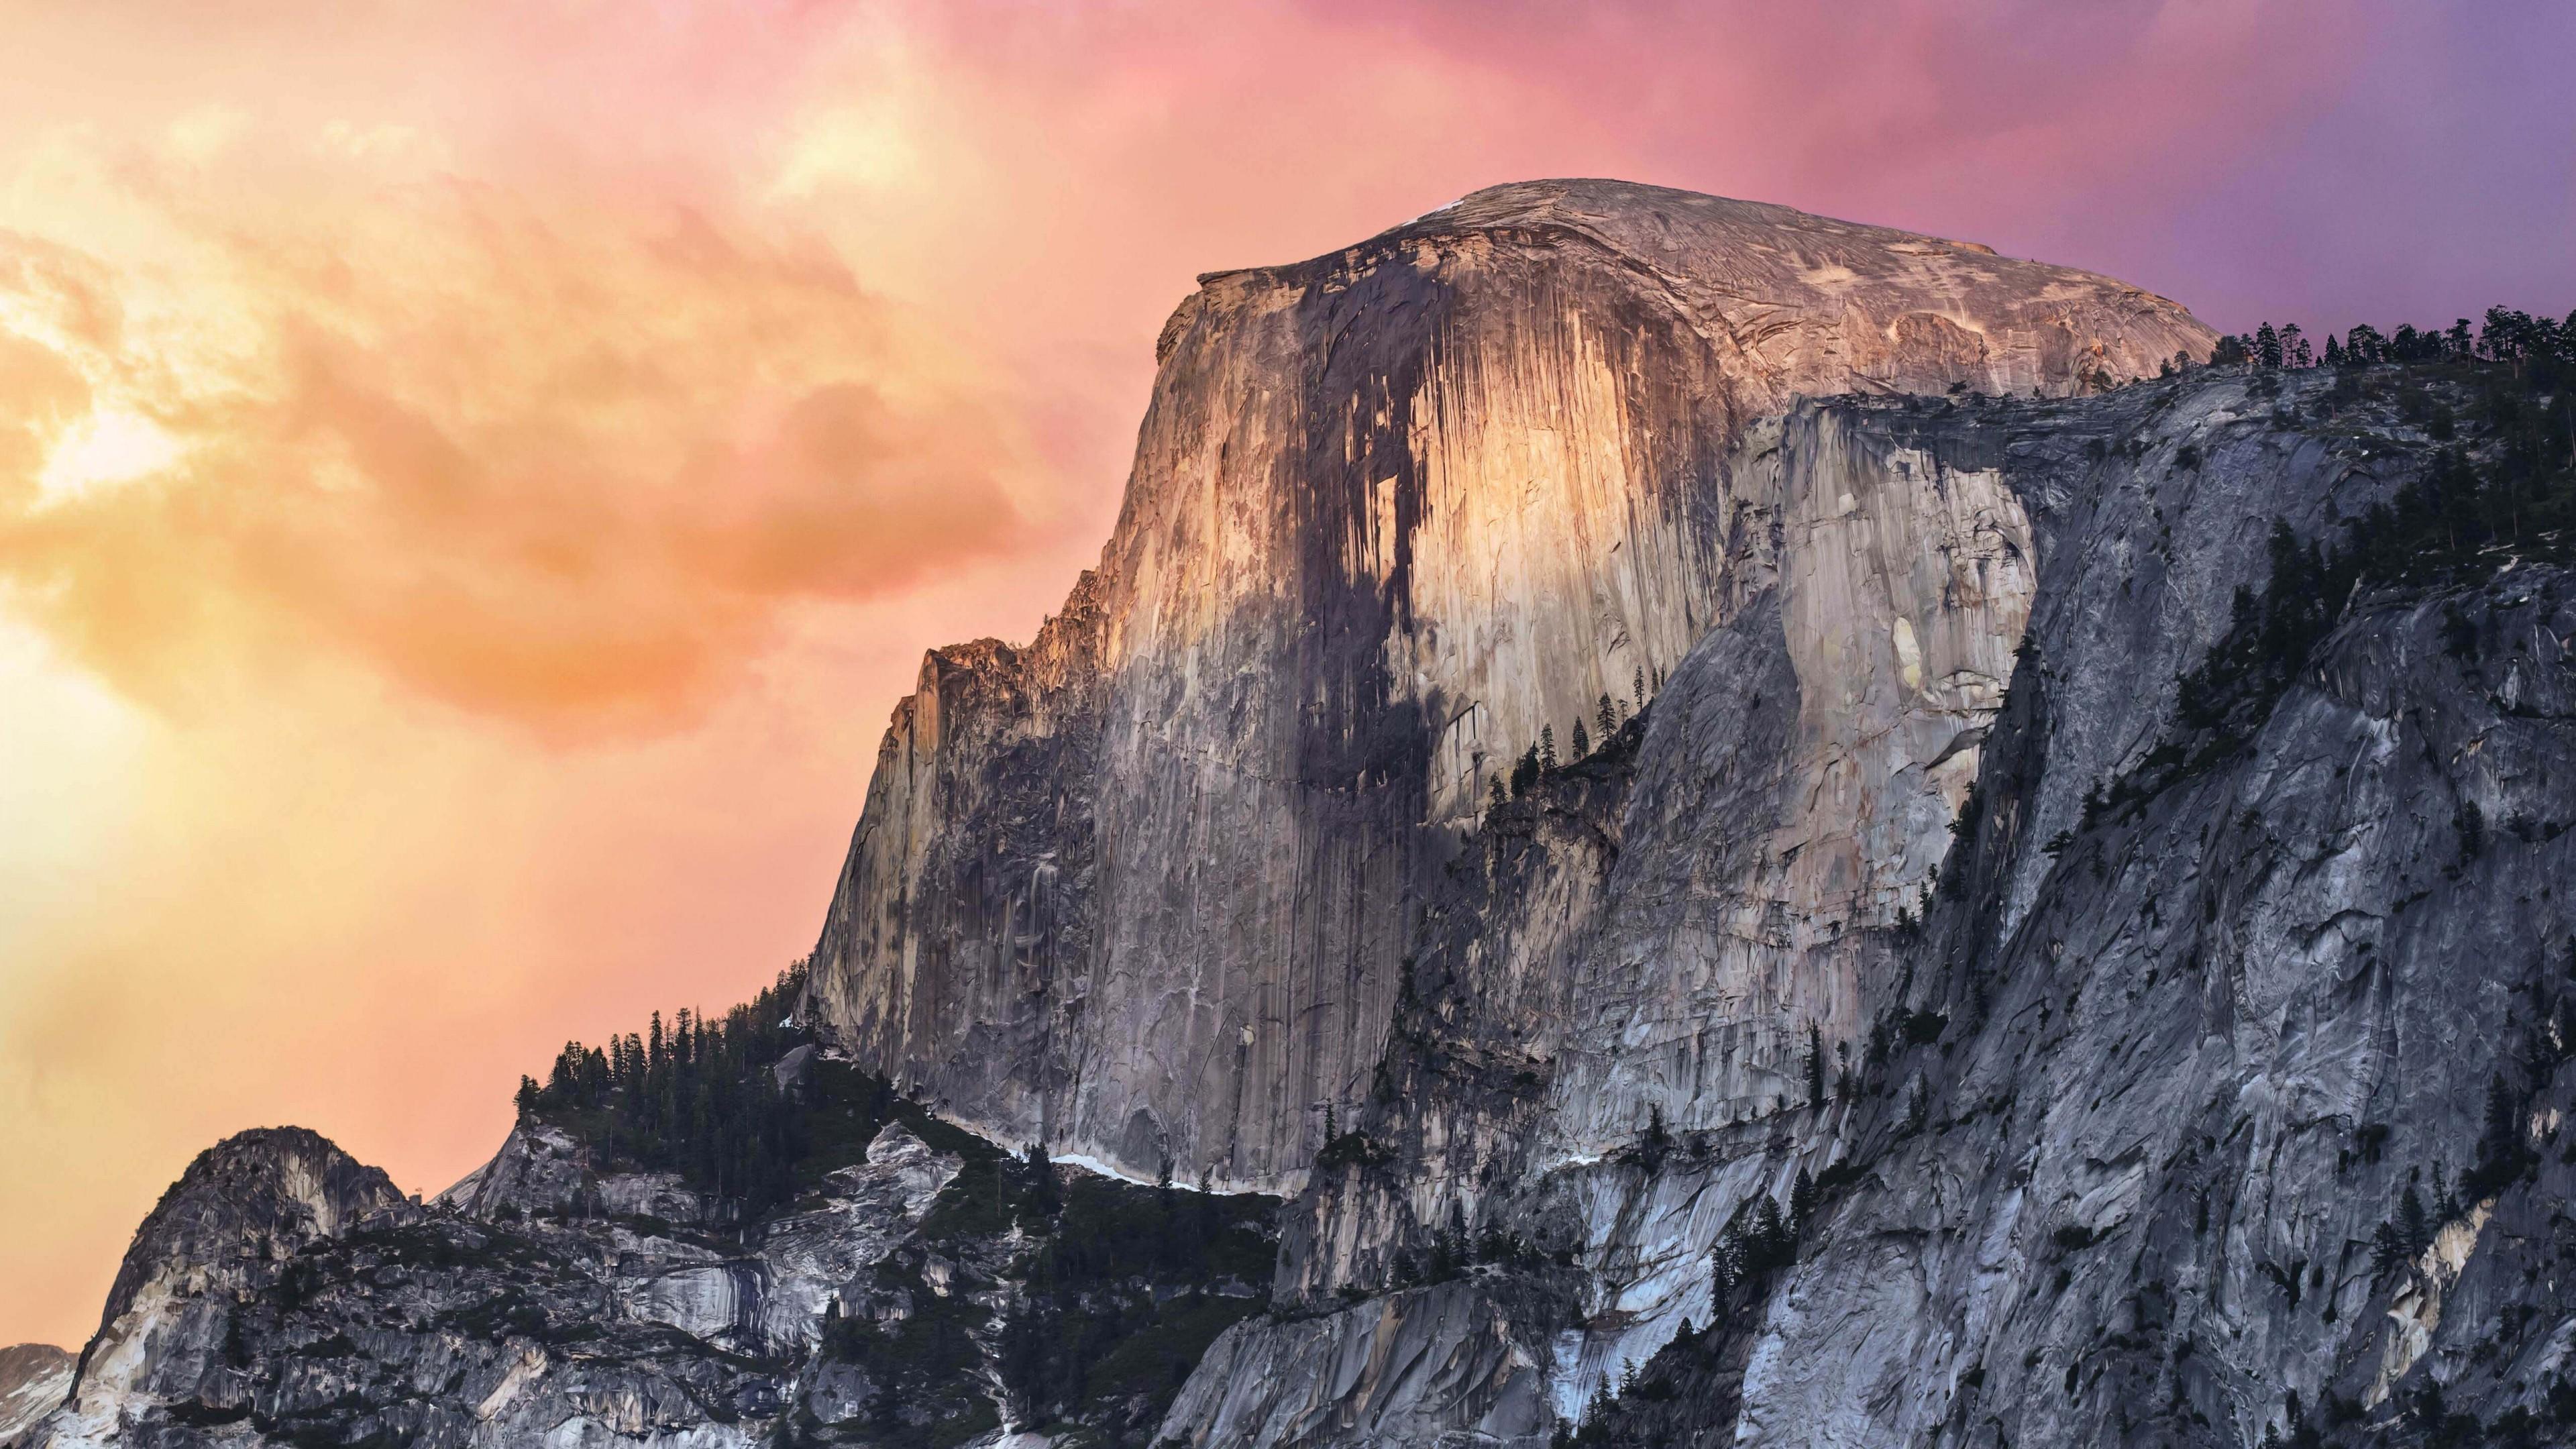 Download Yosemite HD wallpaper for 4K 3840 x 2160   HDwallpapersnet 3840x2160